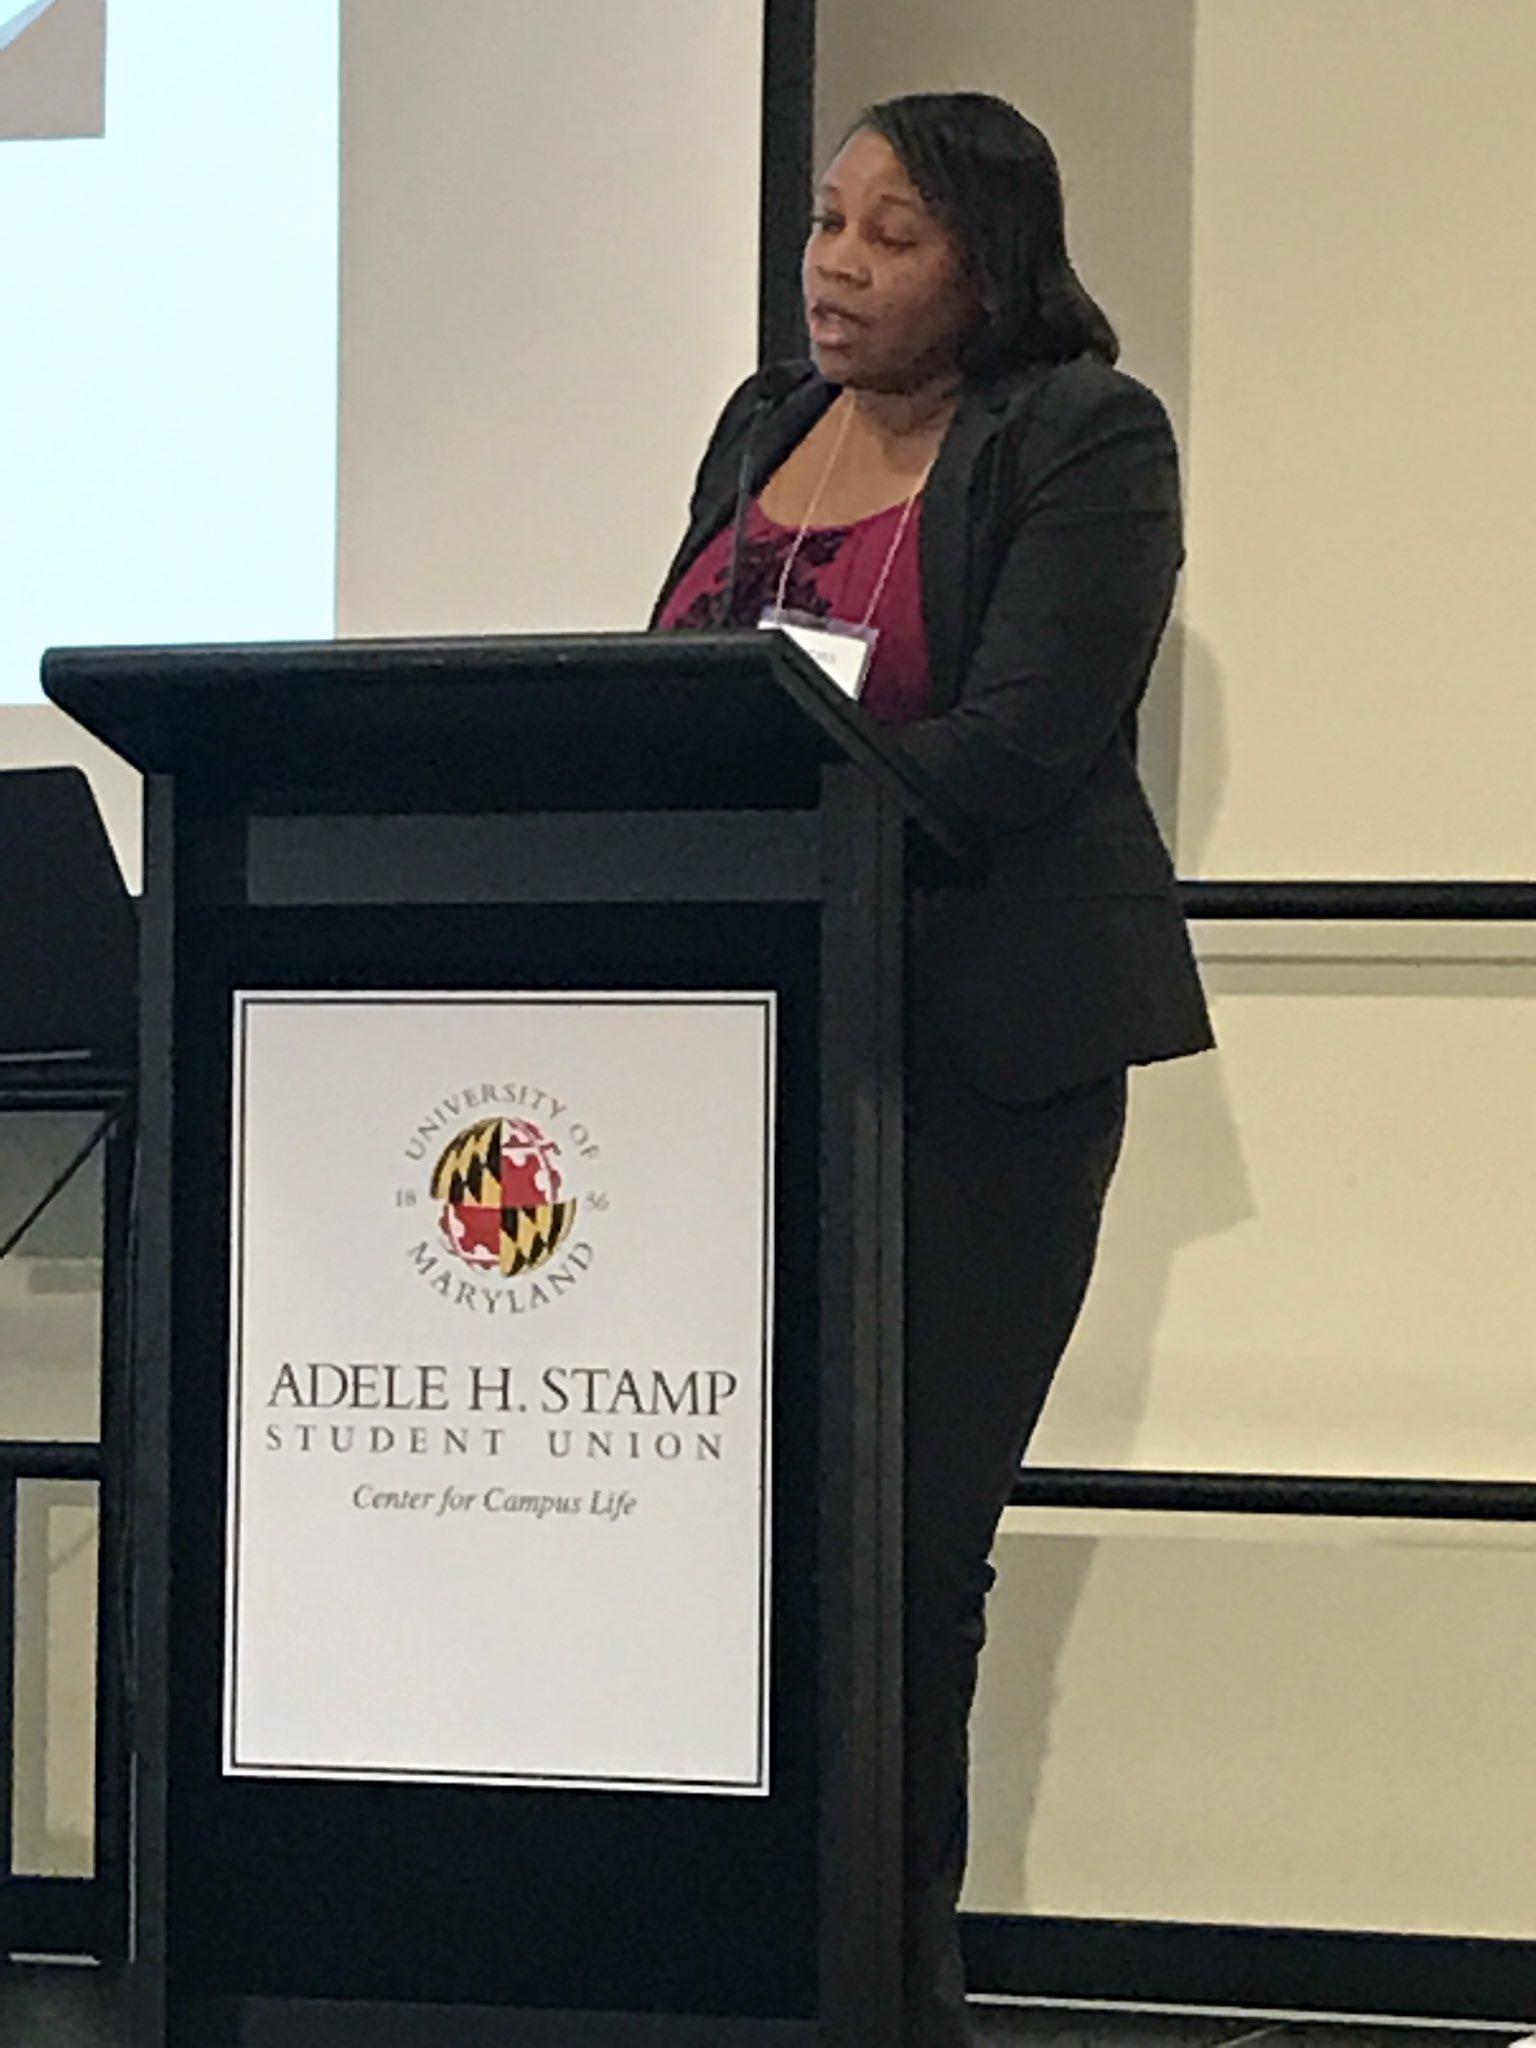 .@Maryland_Alumni Dr. Courtney Aklin from Natl Inst on Minority Health & Health Disparities in panel on health equity. #publichealthMD #nphw https://t.co/Etj5fO8D7u